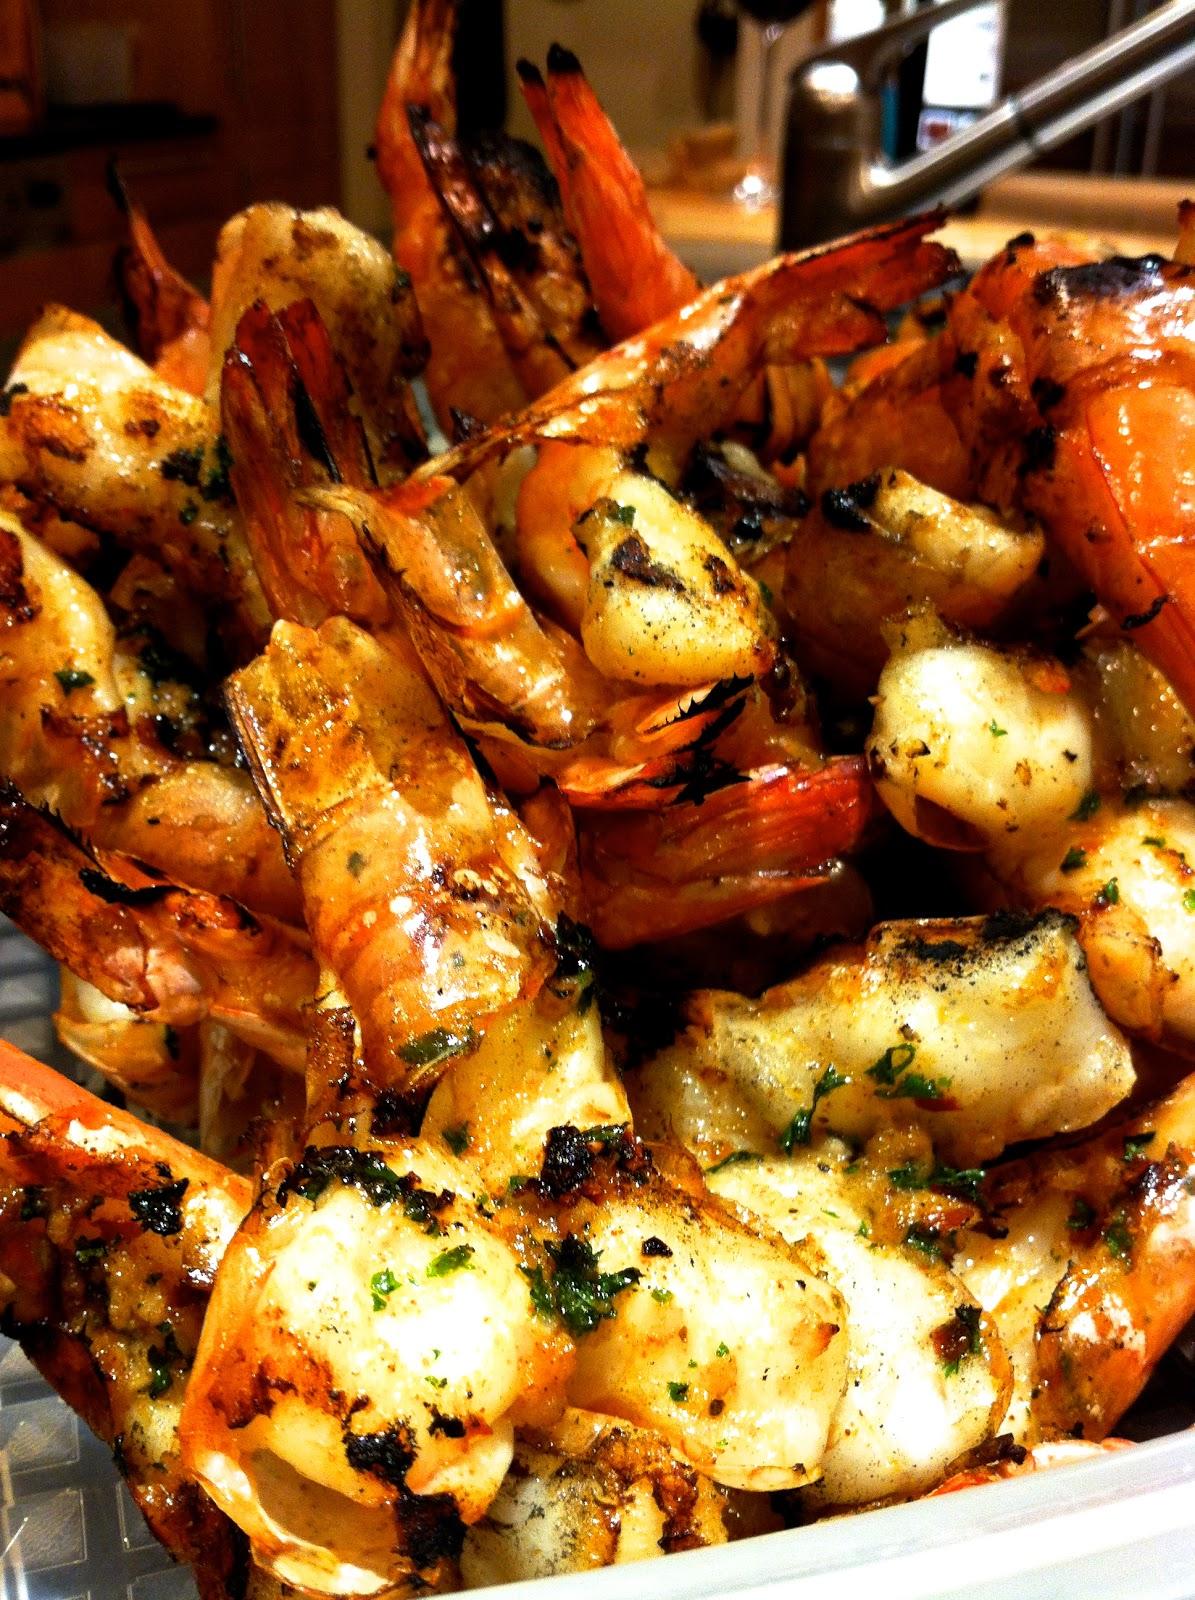 shrimp we really buy shrimp i think our all time high is 30lbs shrimp ...